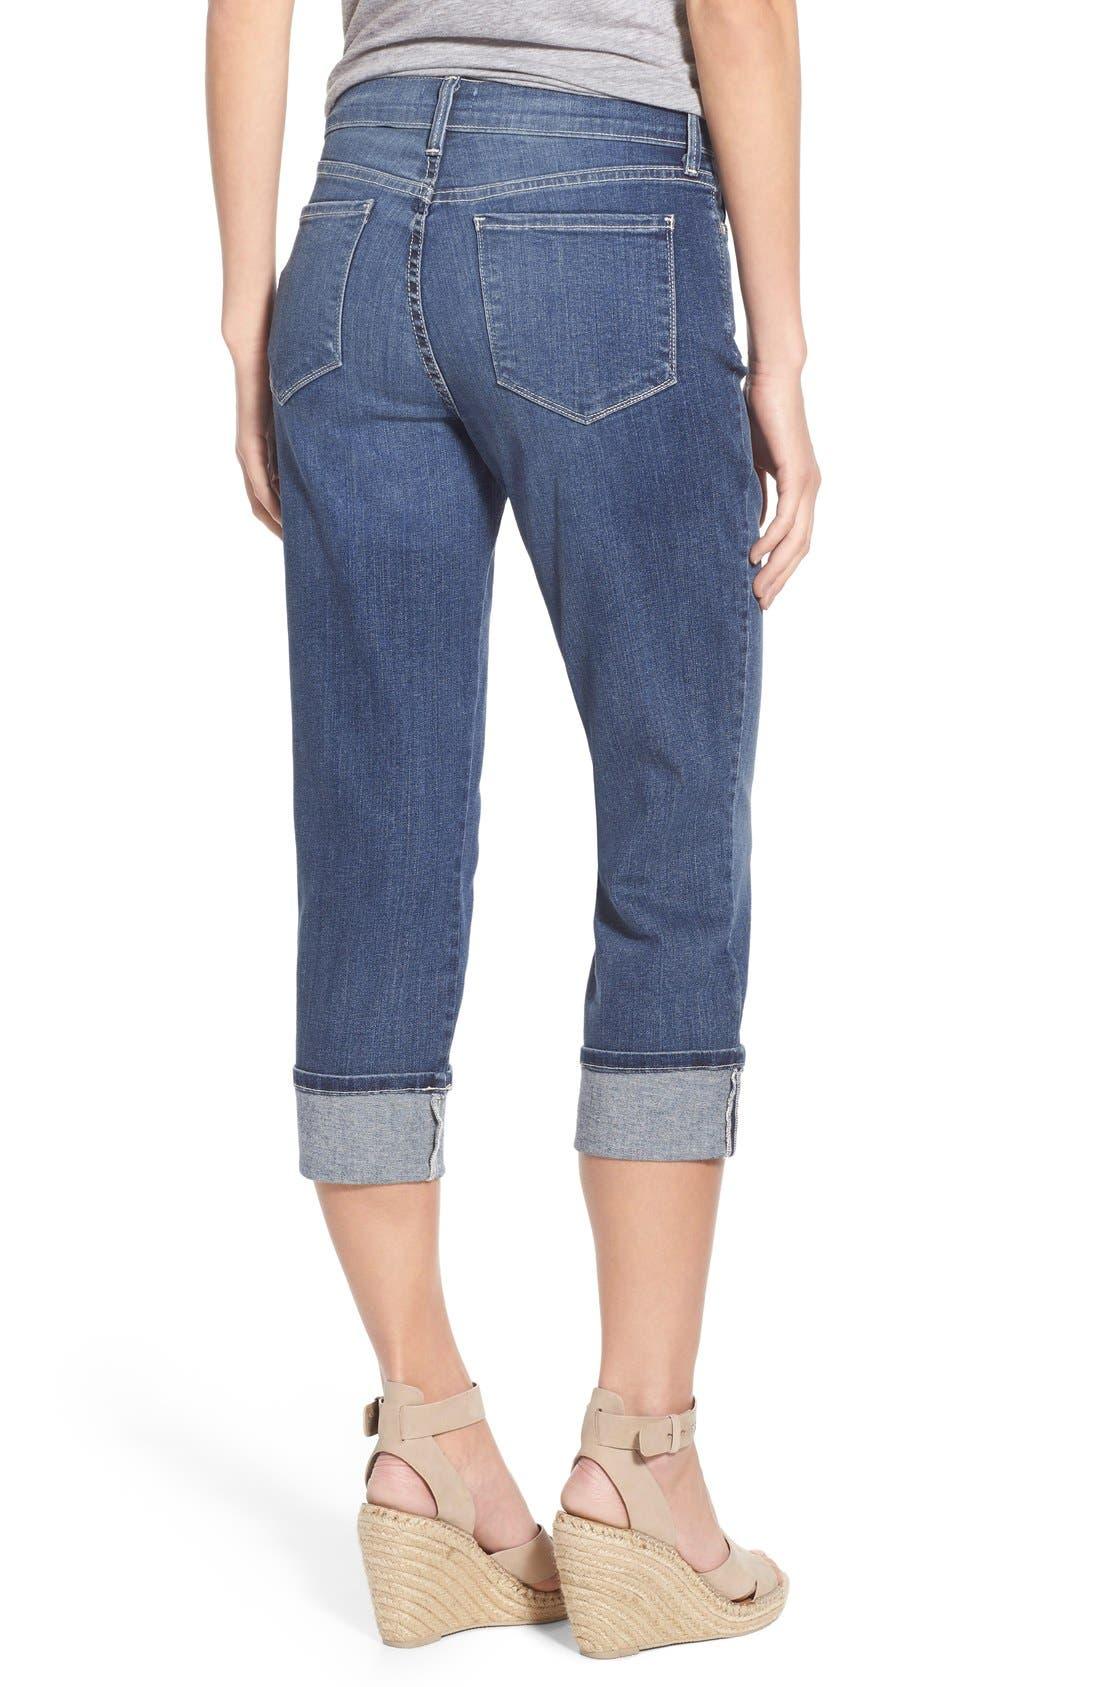 'Dayla' Colored Wide Cuff Capri Jeans,                             Alternate thumbnail 64, color,